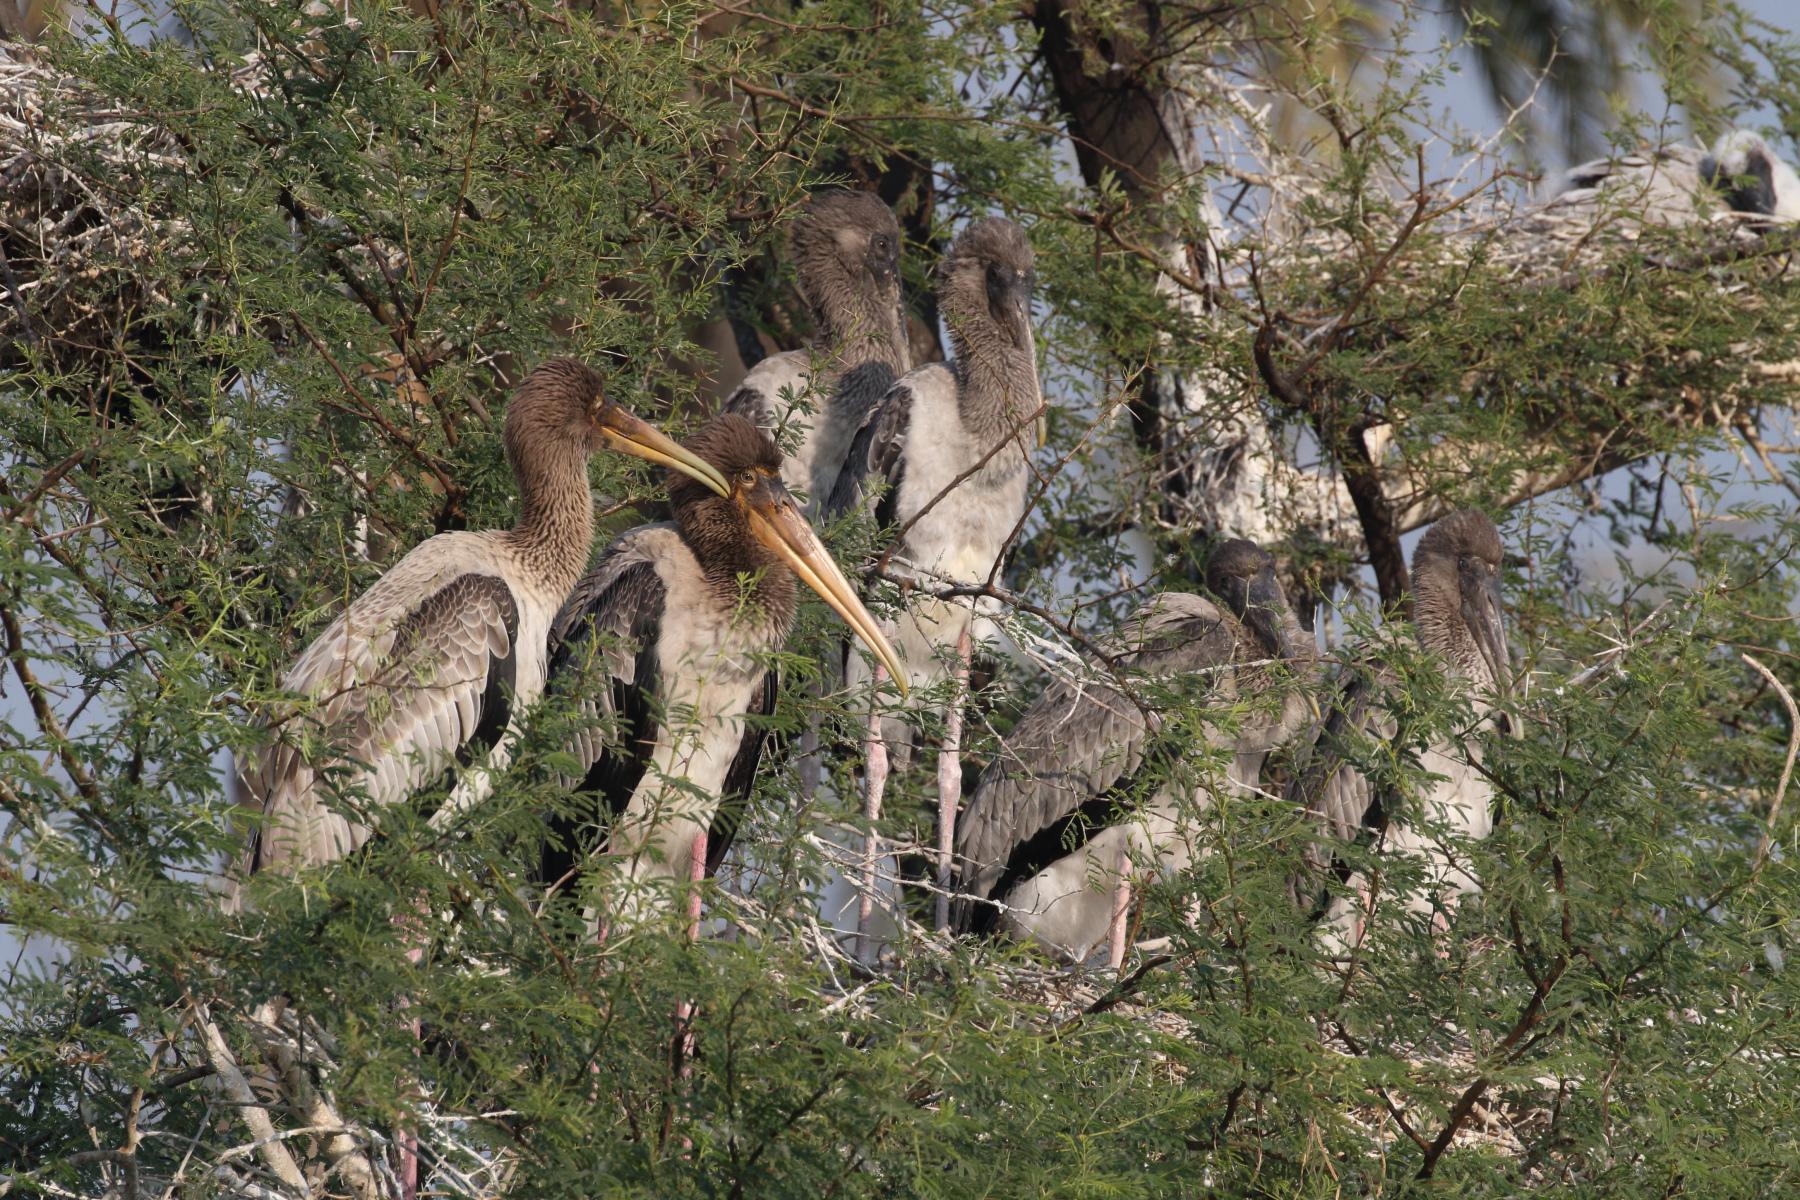 Nestlings and fledglings of Painted Stork